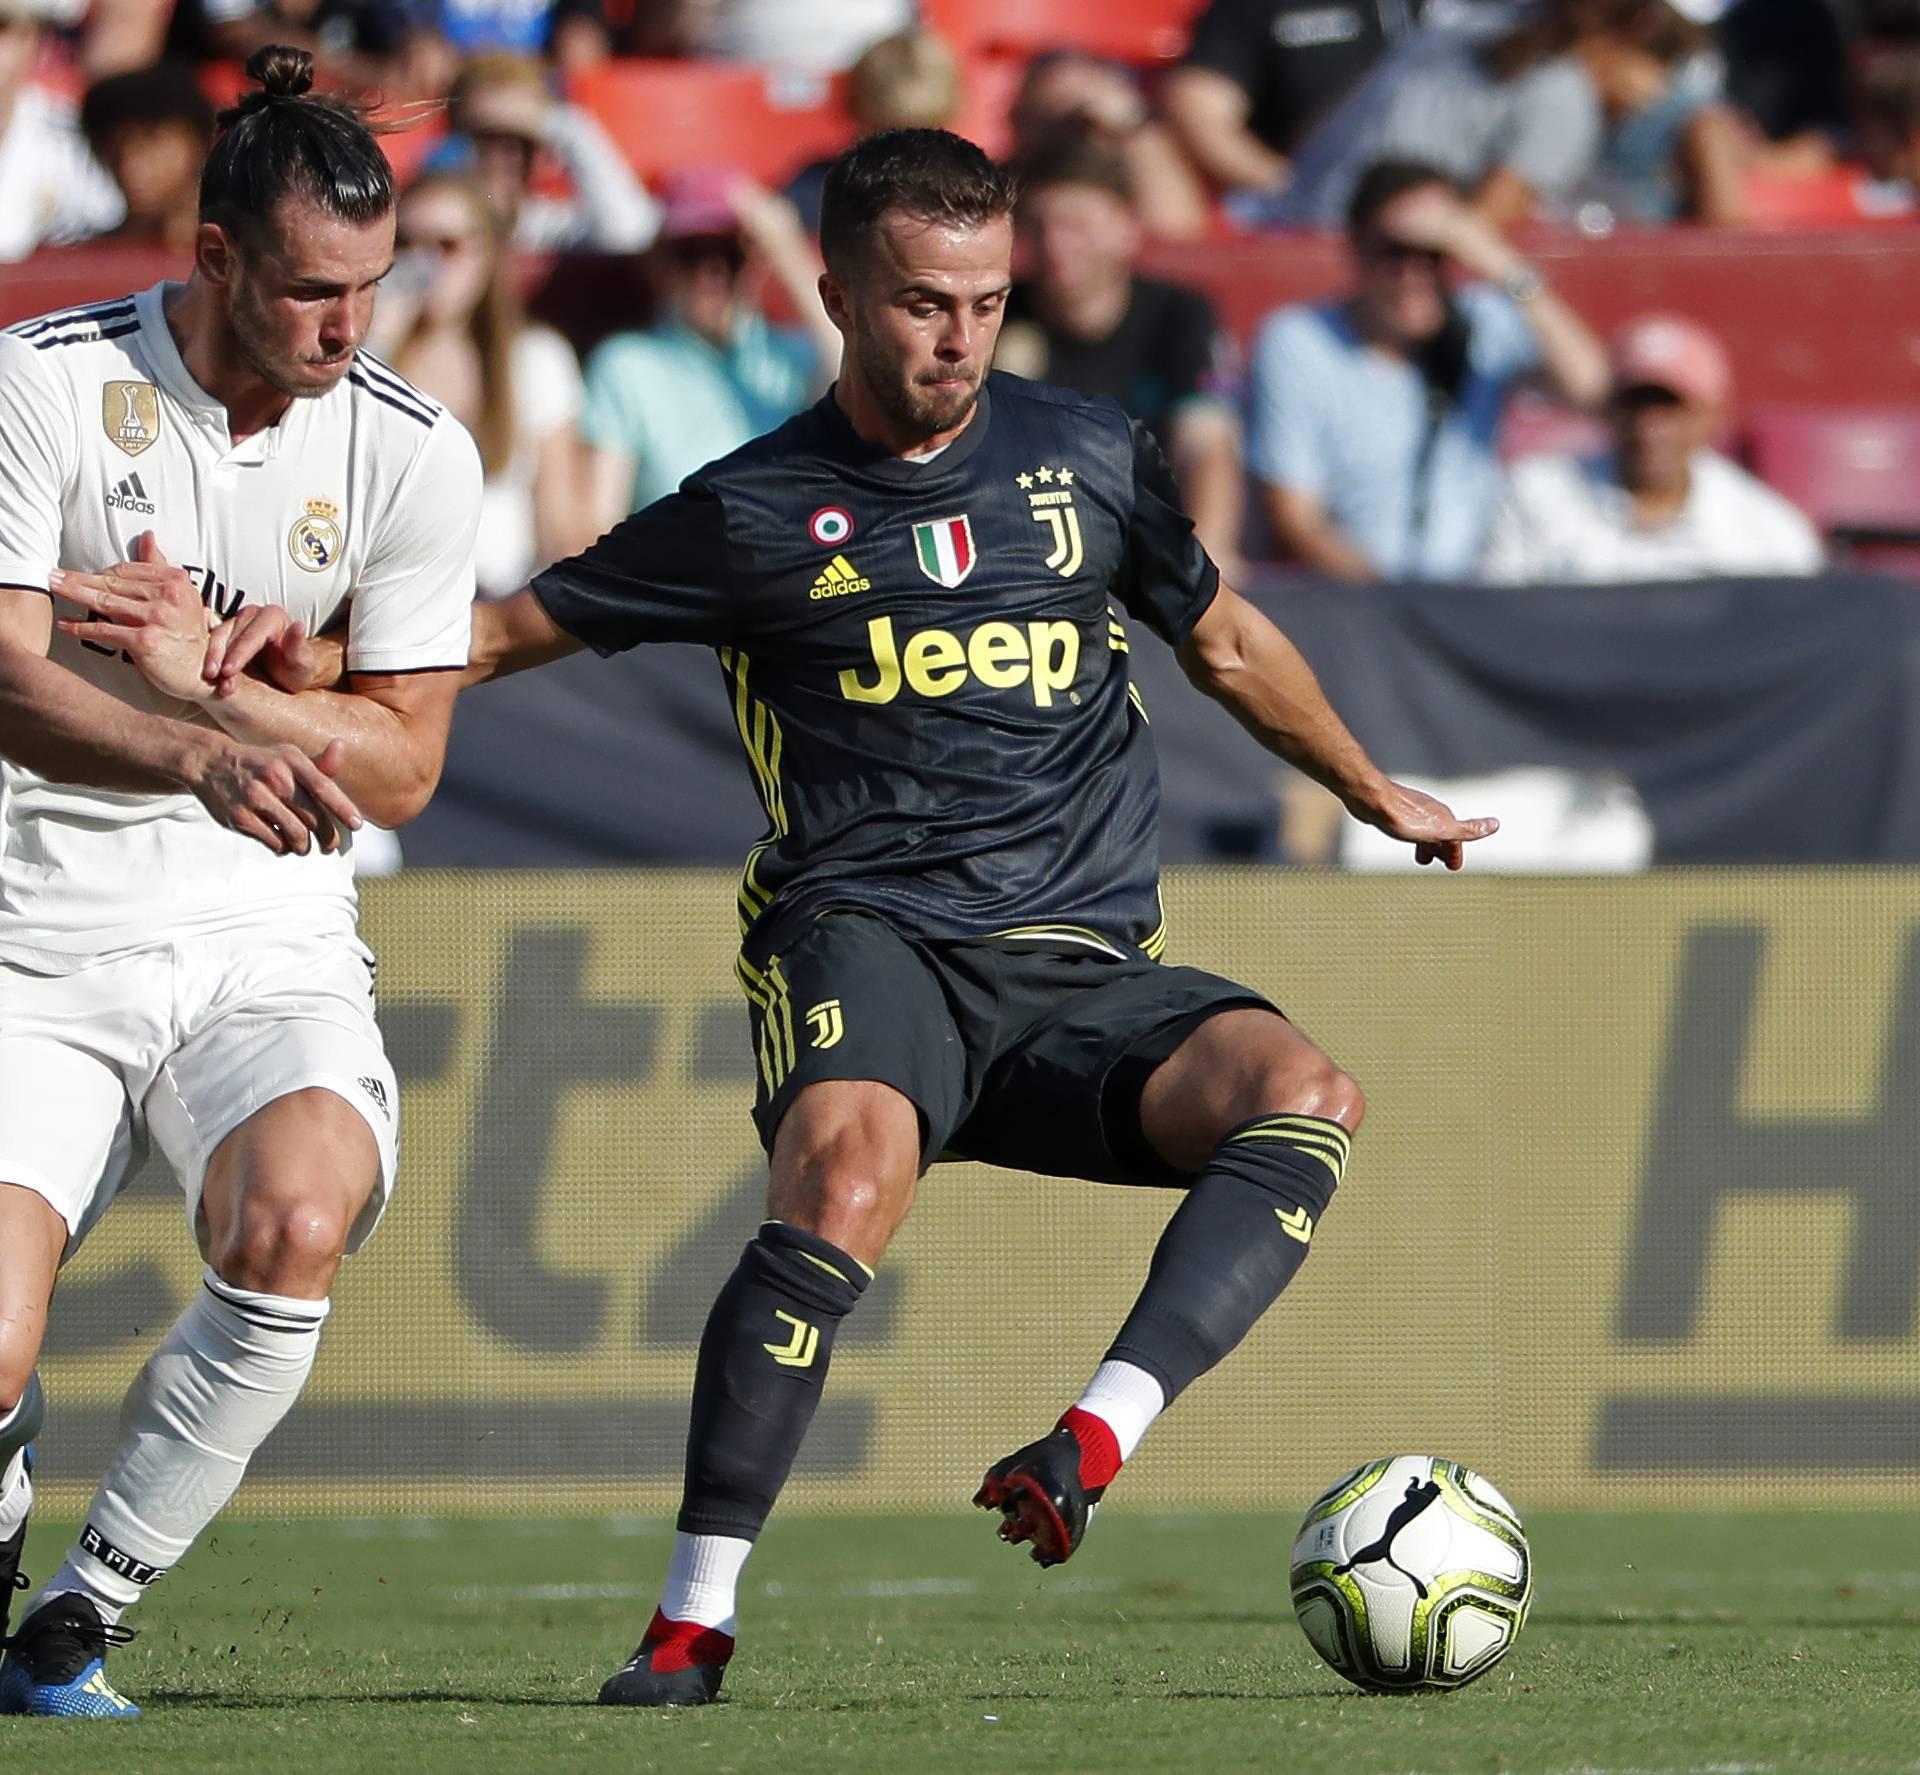 Soccer: International Champions Cup-Real Madrid at Juventus